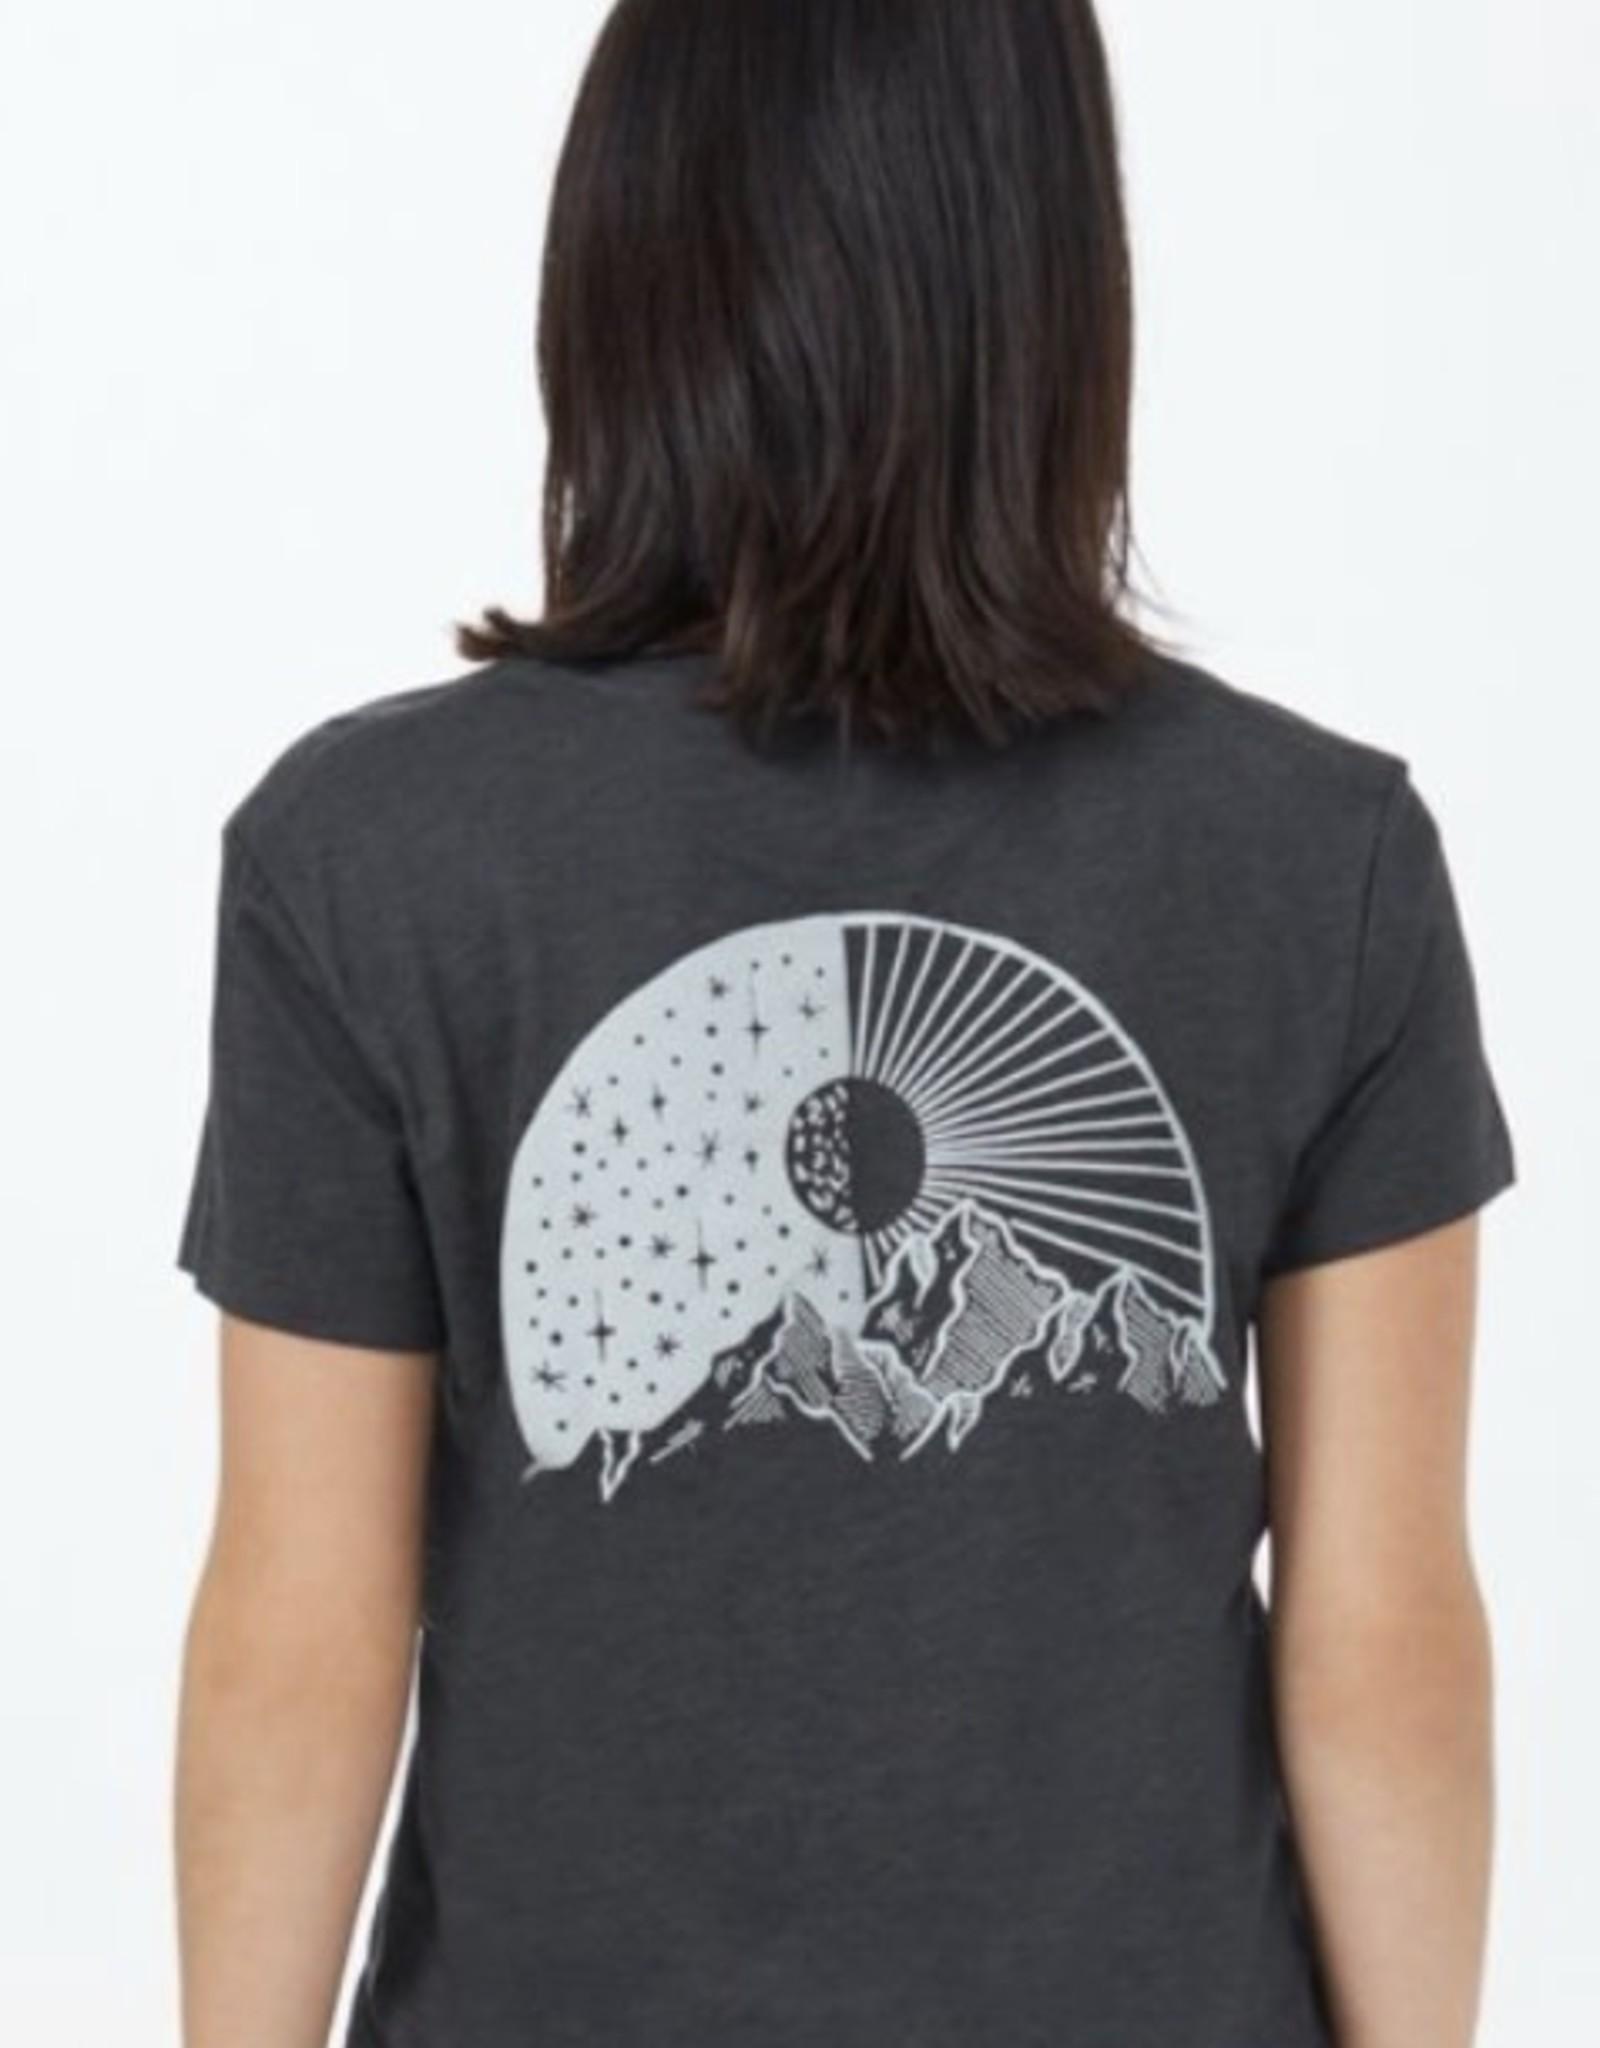 tentree Sunrise, Sunset Boyfriends T-Shirt